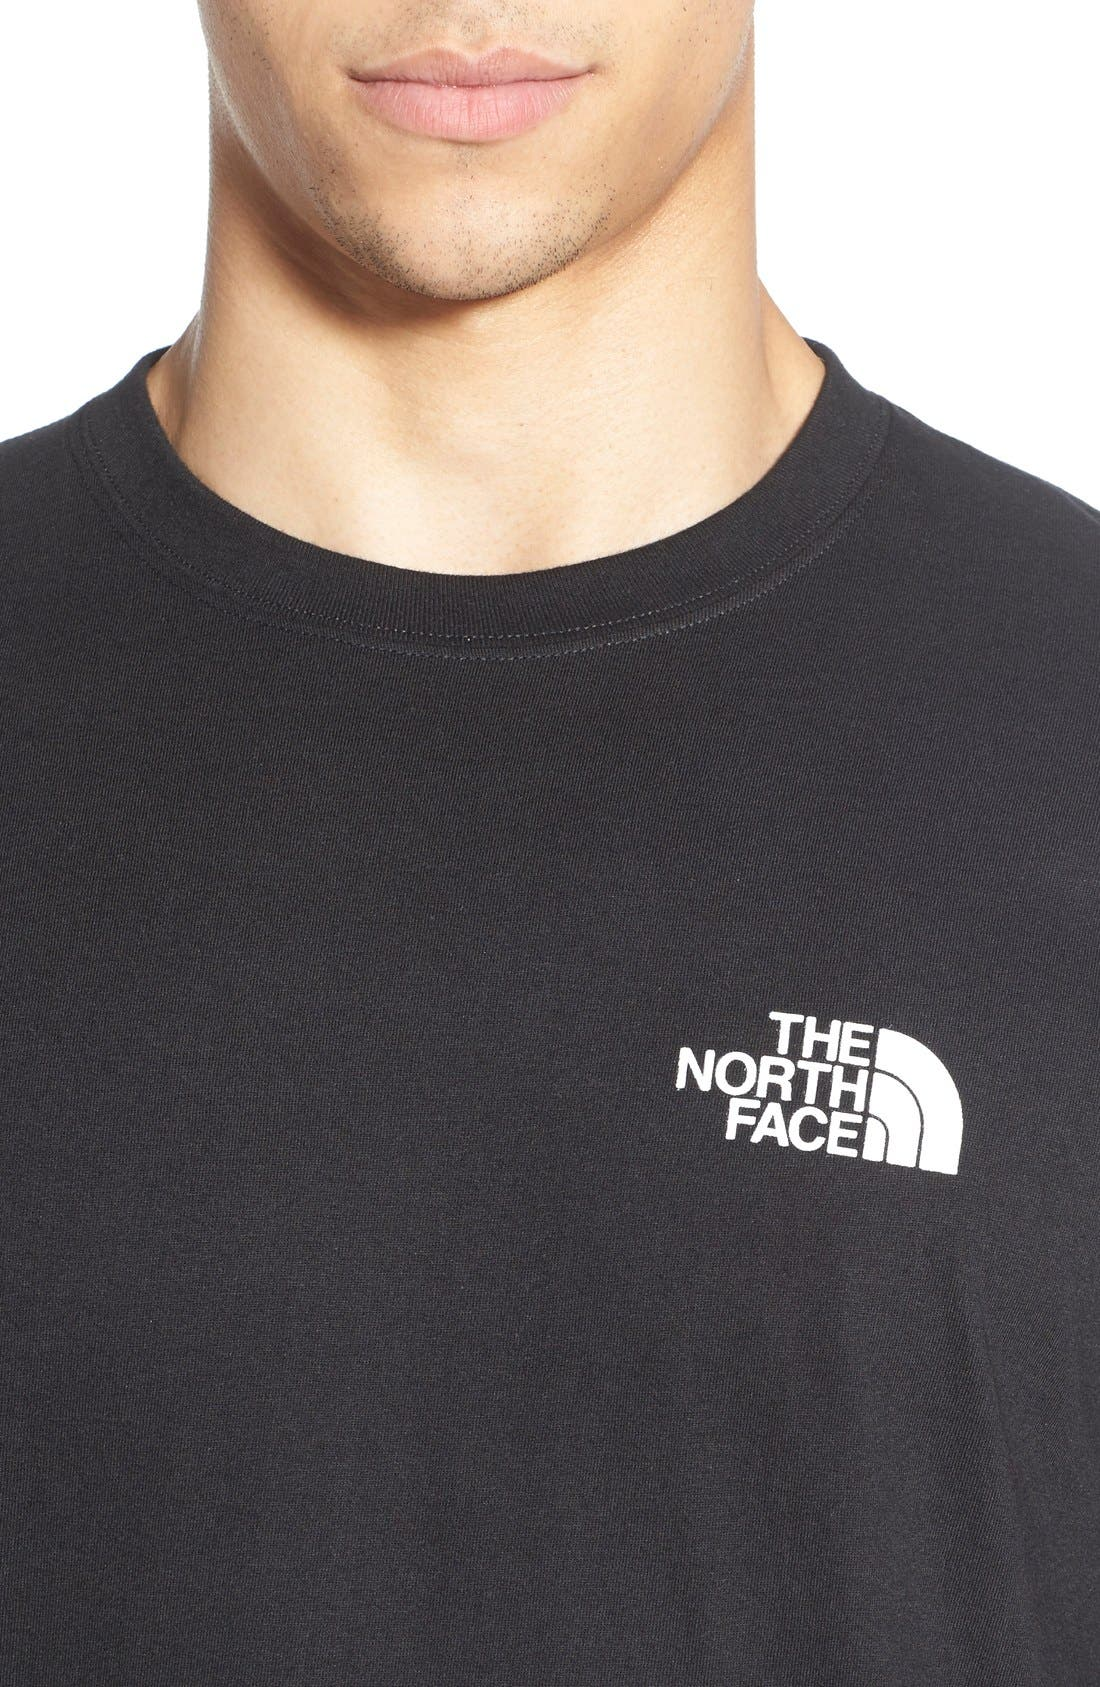 'Red Box' Graphic T-Shirt,                             Alternate thumbnail 4, color,                             TNF BLACK/ TNF WHITE